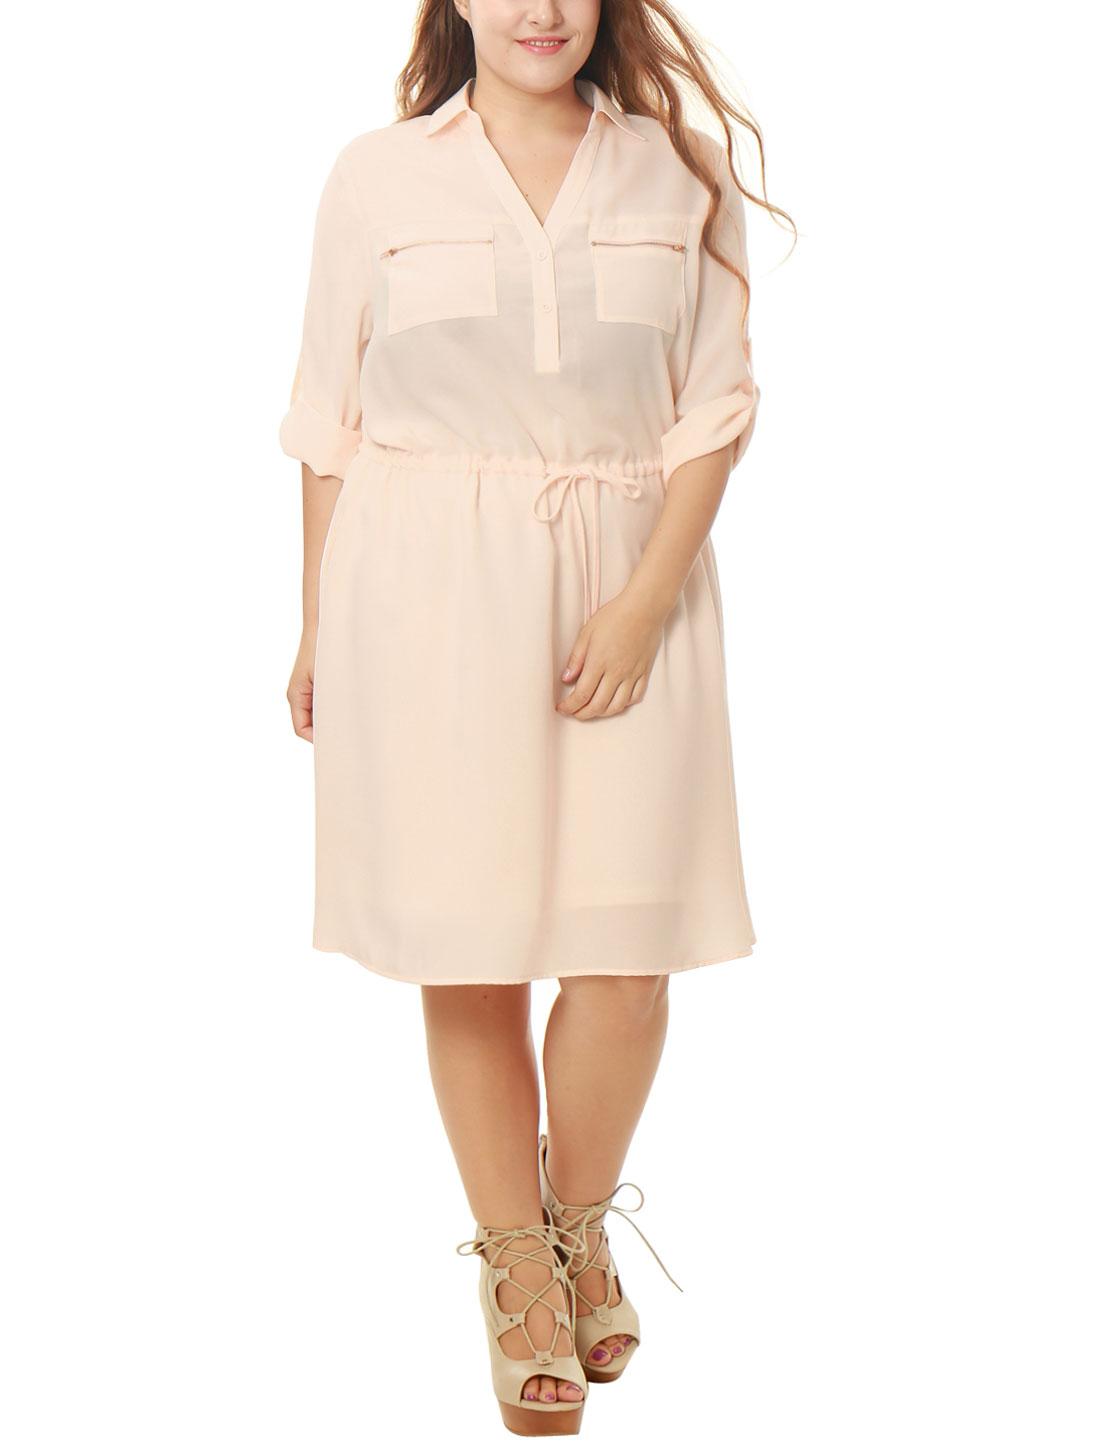 Women Plus Size Drawstring Waist Roll Up Sleeves Dress Pink 2X